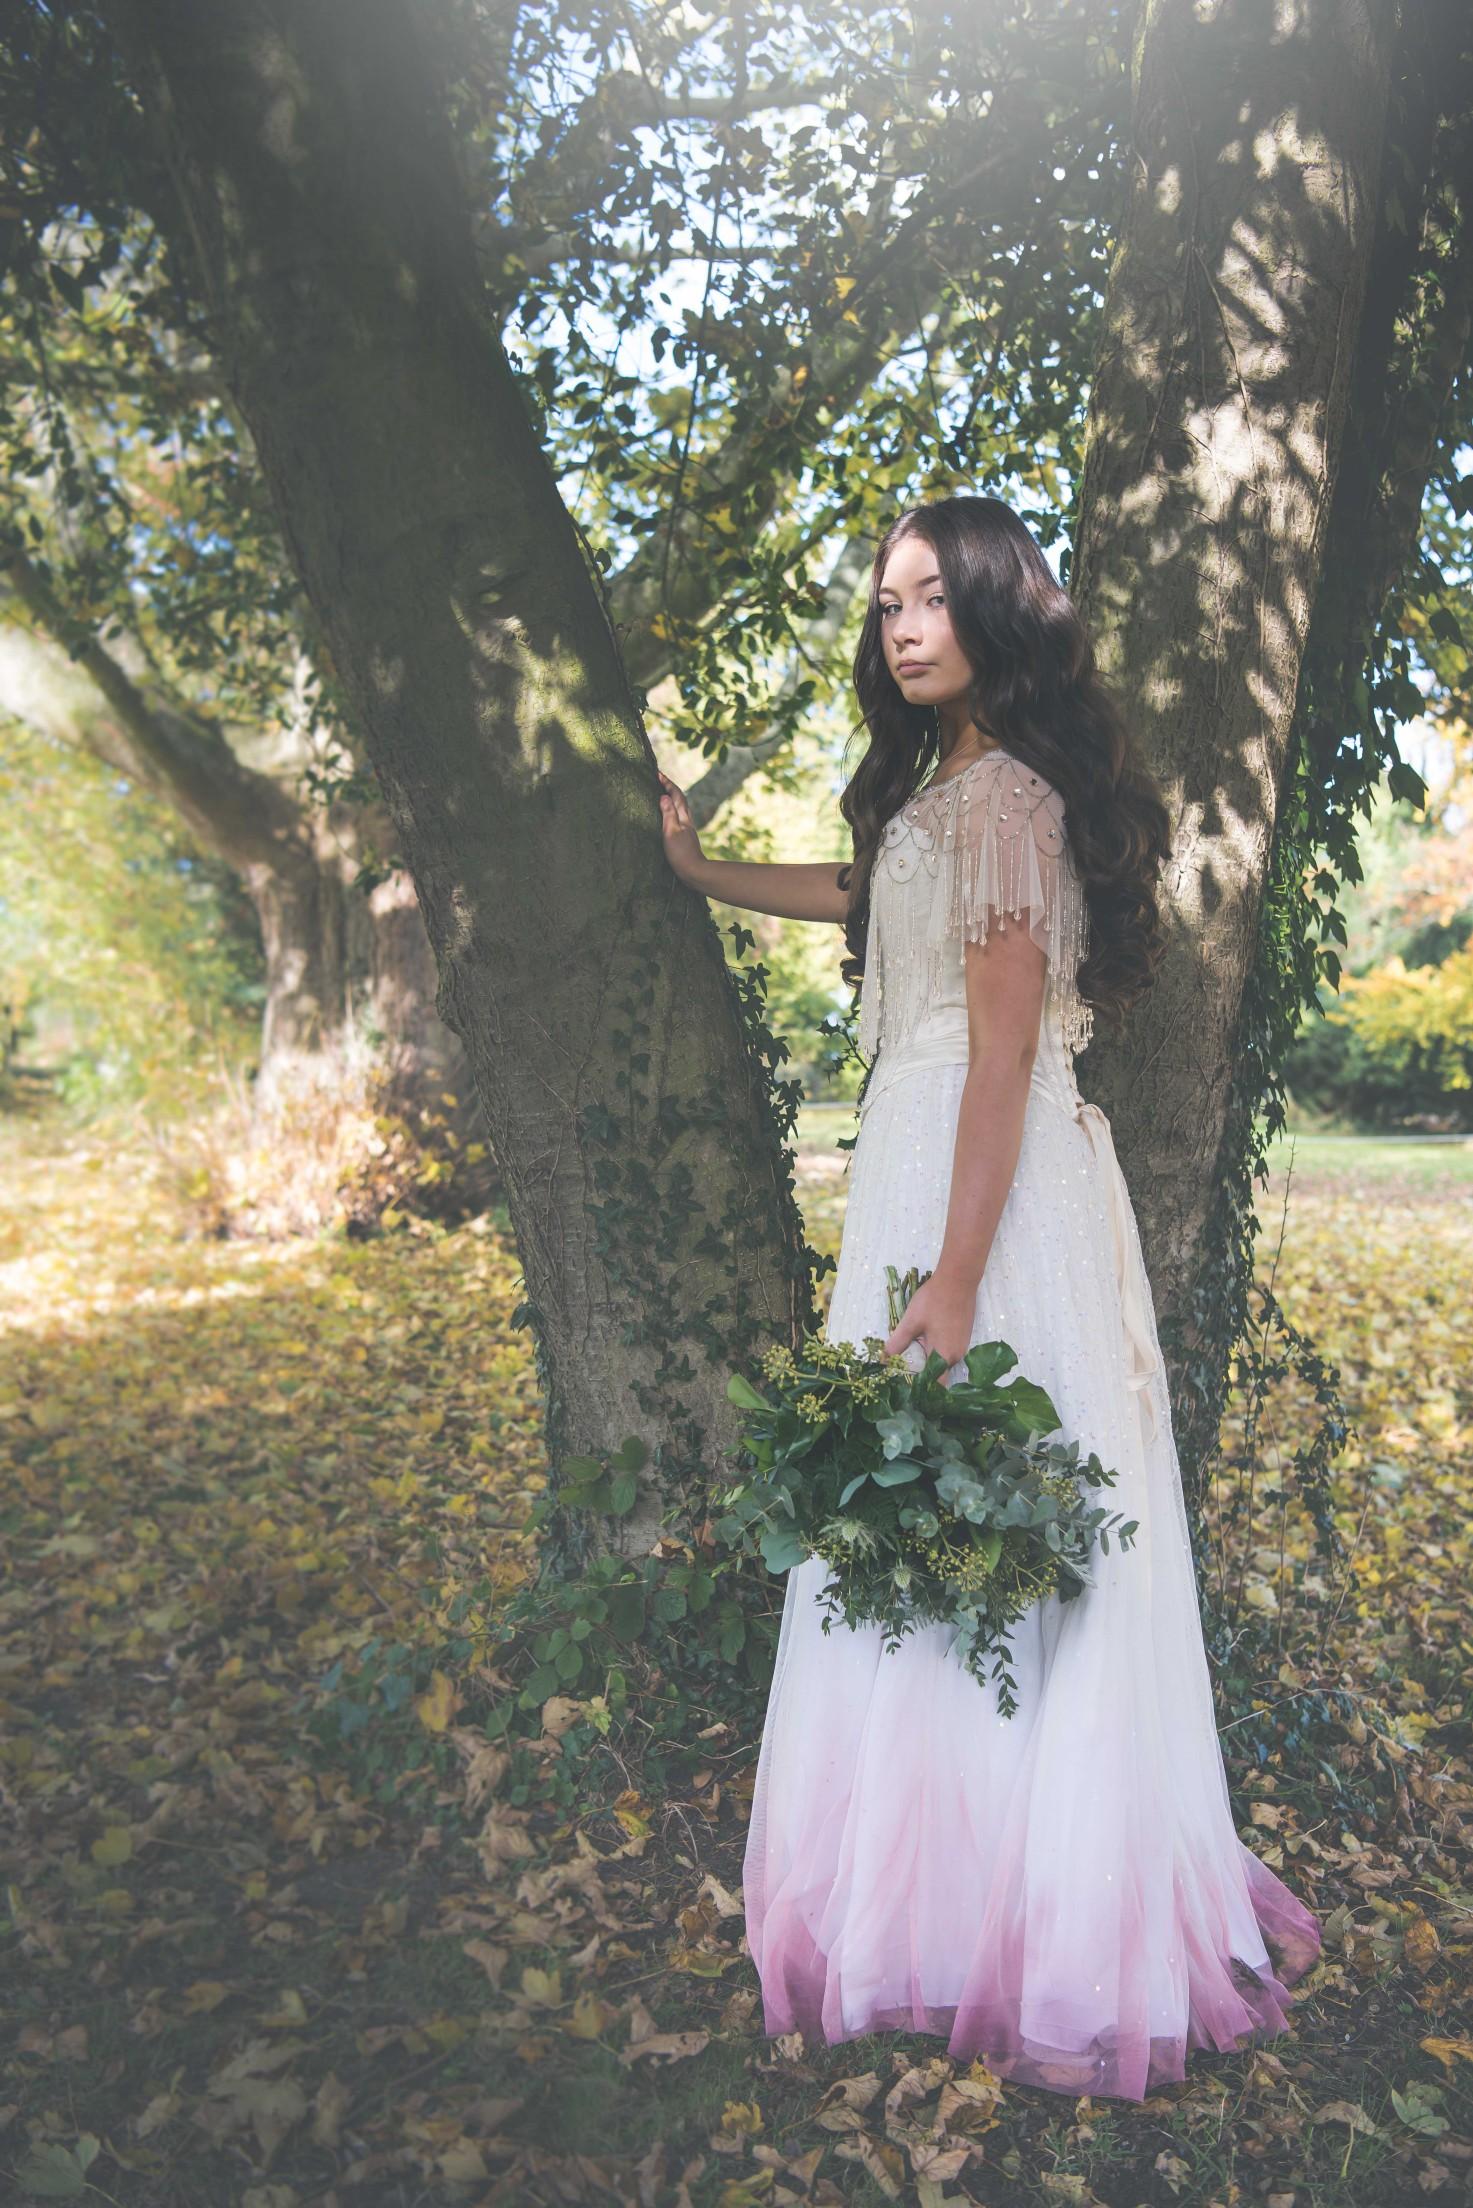 Live your own fairytale wedding - BexBrides - Jervaulx-0012a [31] (2)